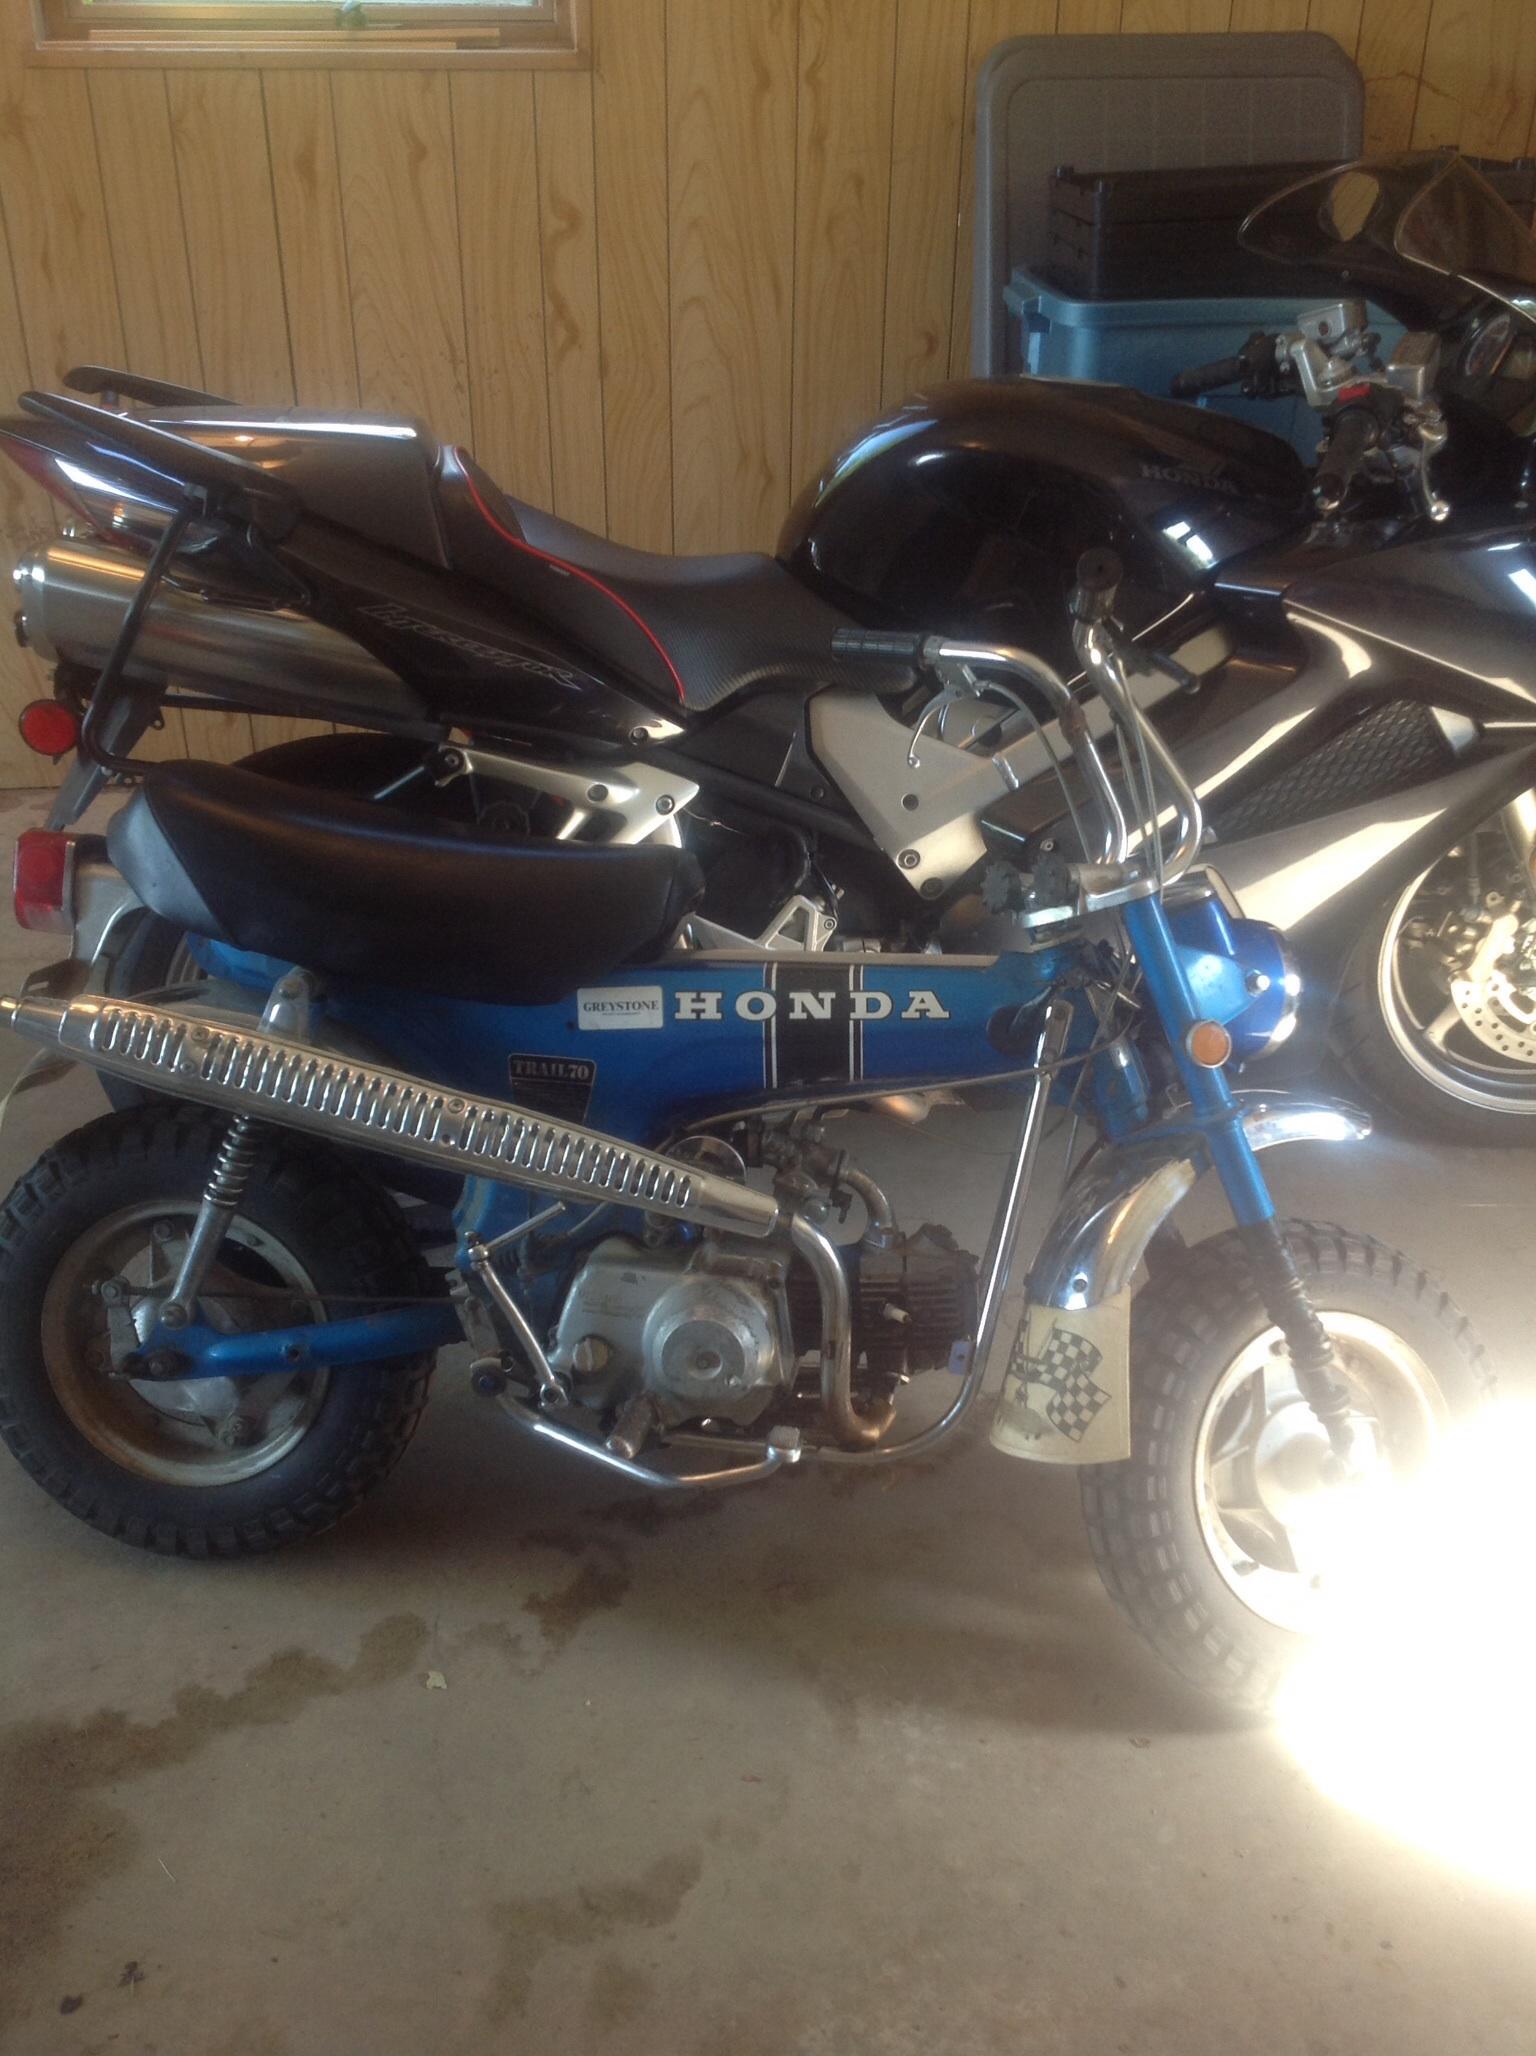 69 Ct70 Kickstart Wont Turn Engine Help Please 1970 Honda Spark Plug Click Image For Larger Version Name Views 154 Size